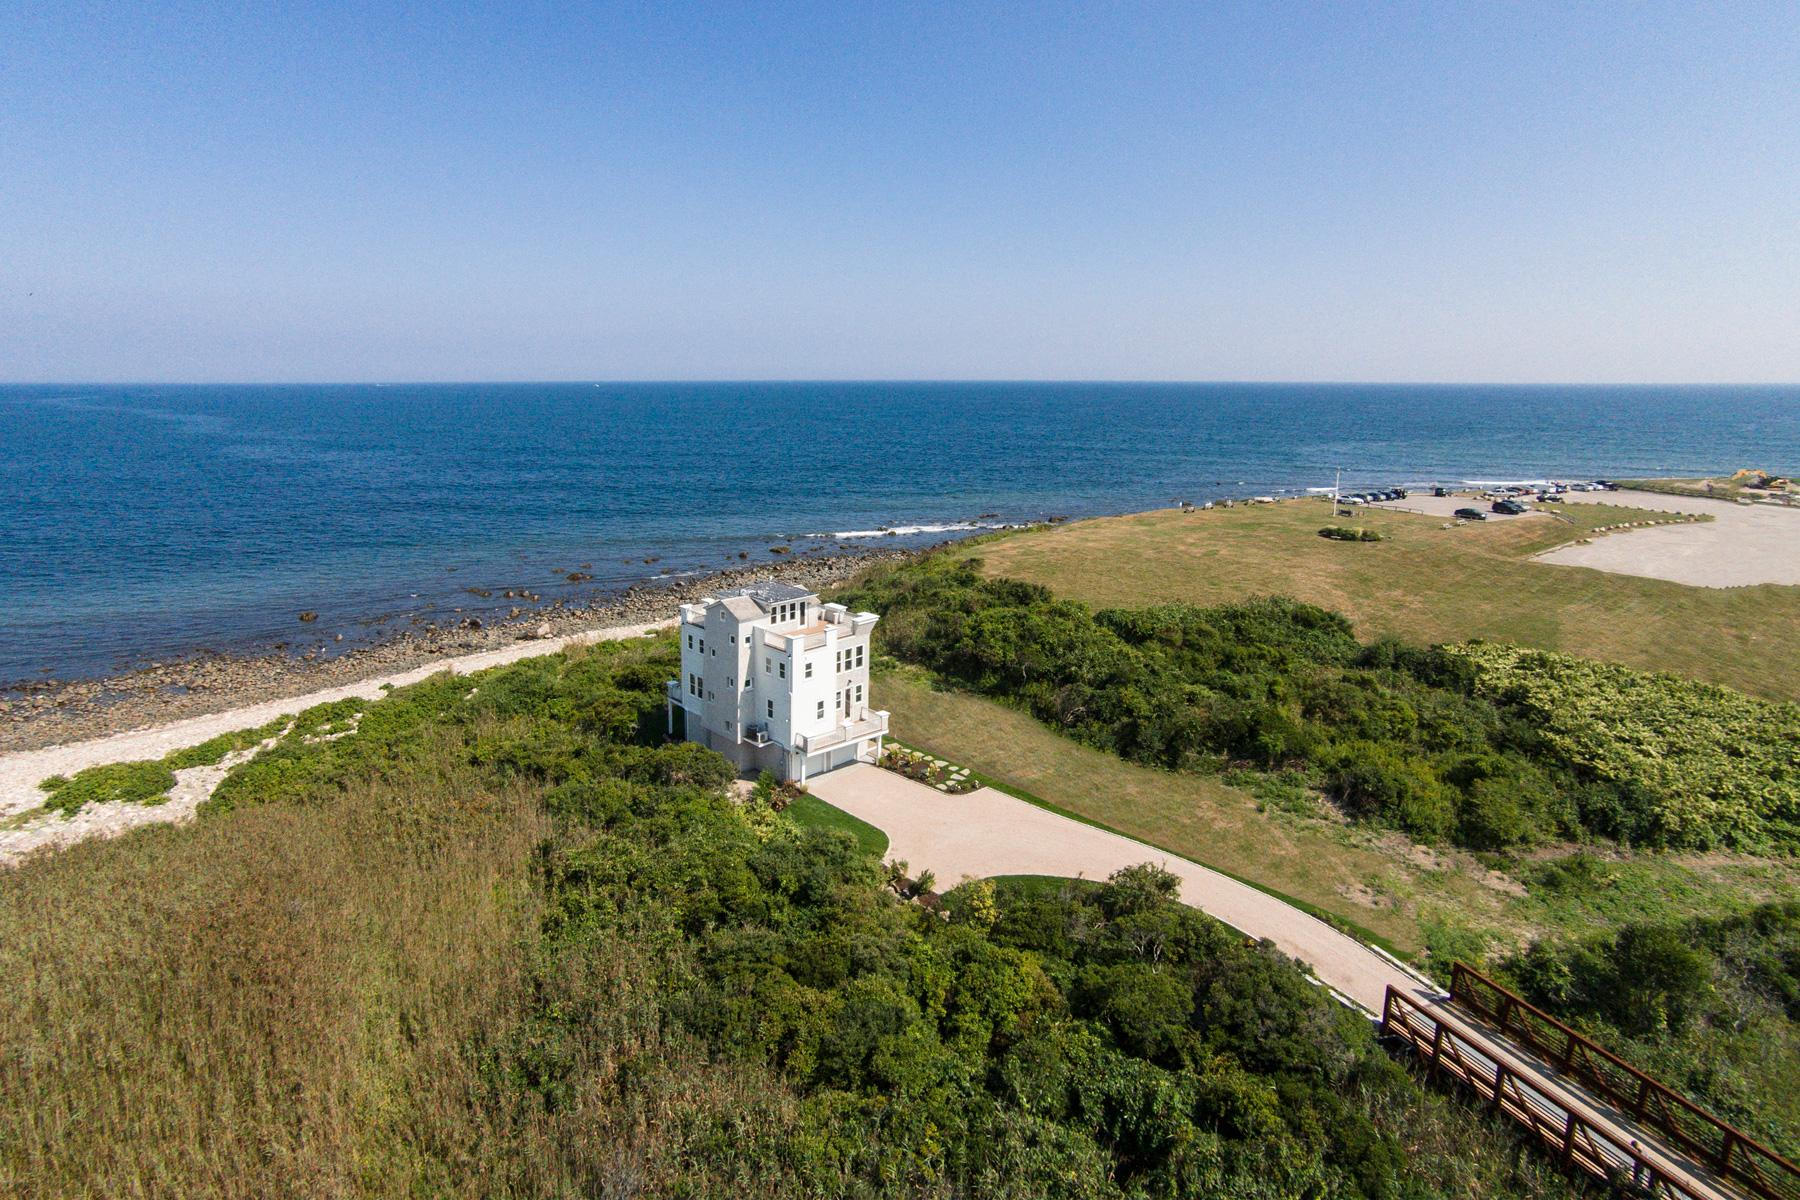 Moradia para Venda às Surrounded by the Sea 1444 Ocean Road Narragansett, Rhode Island 02882 Estados Unidos